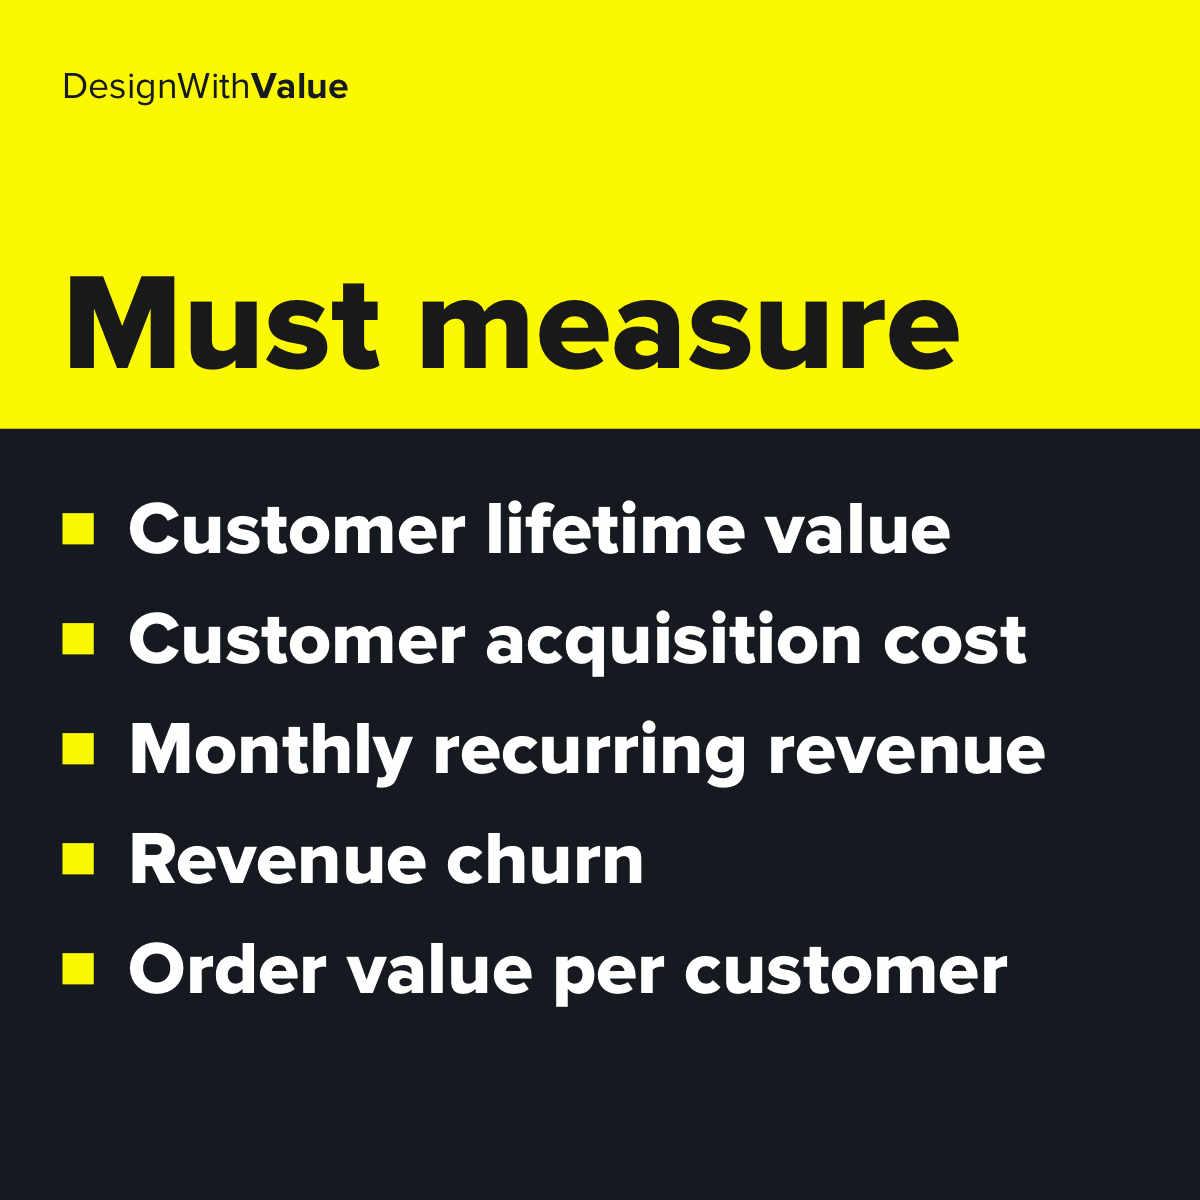 List of metrics: Customer lifetime value, customer acquisition cost, monthly recurring revenue, revenue churn, order value per customer.